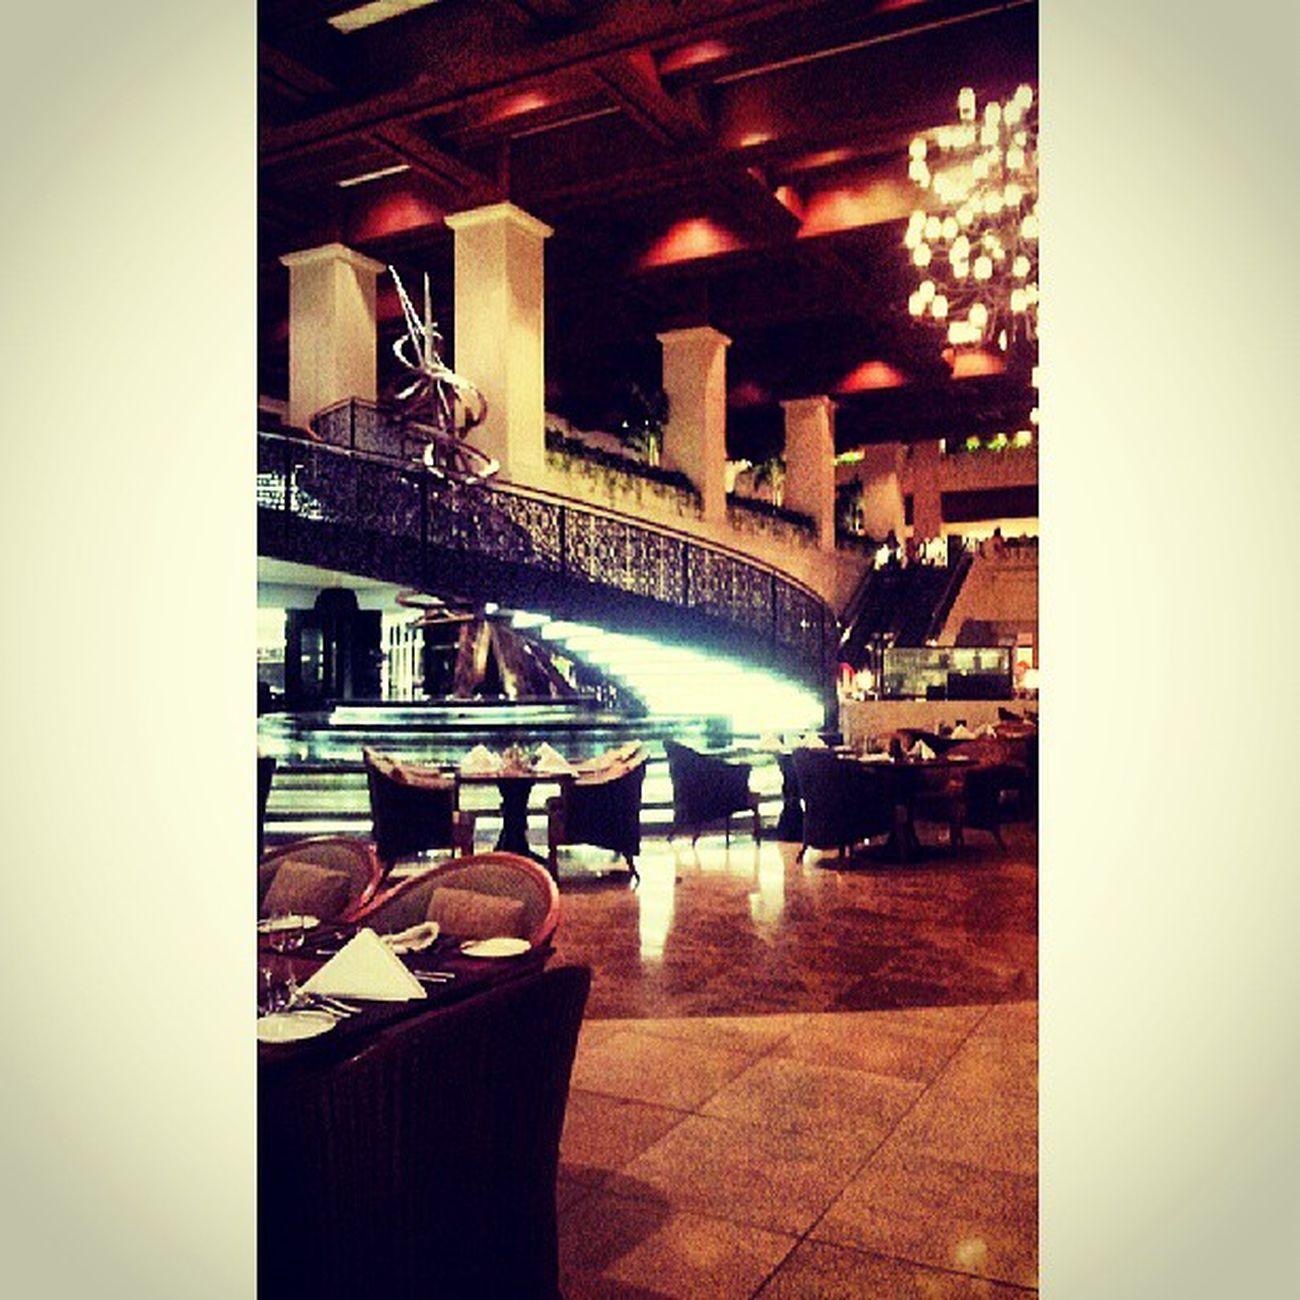 Spiral Sofitelmanila Sofitel Luxuryhotel Itsmorefuninthephilippines travelphilippines phonephotography samsungphotography s2photography